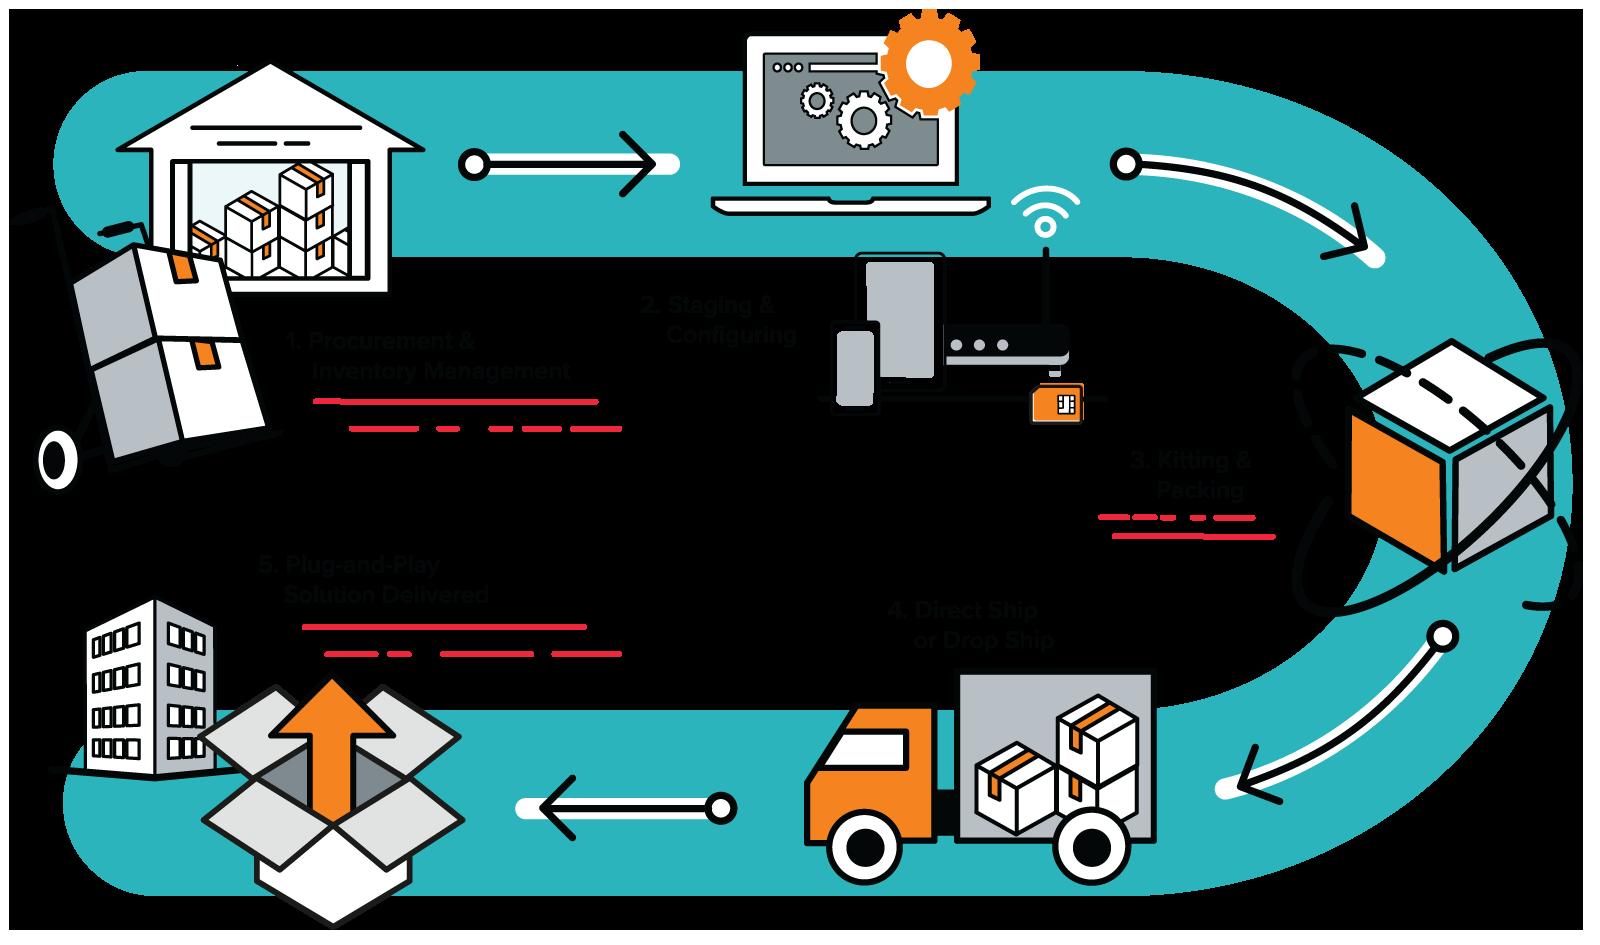 Preconfigured hardware shipment process